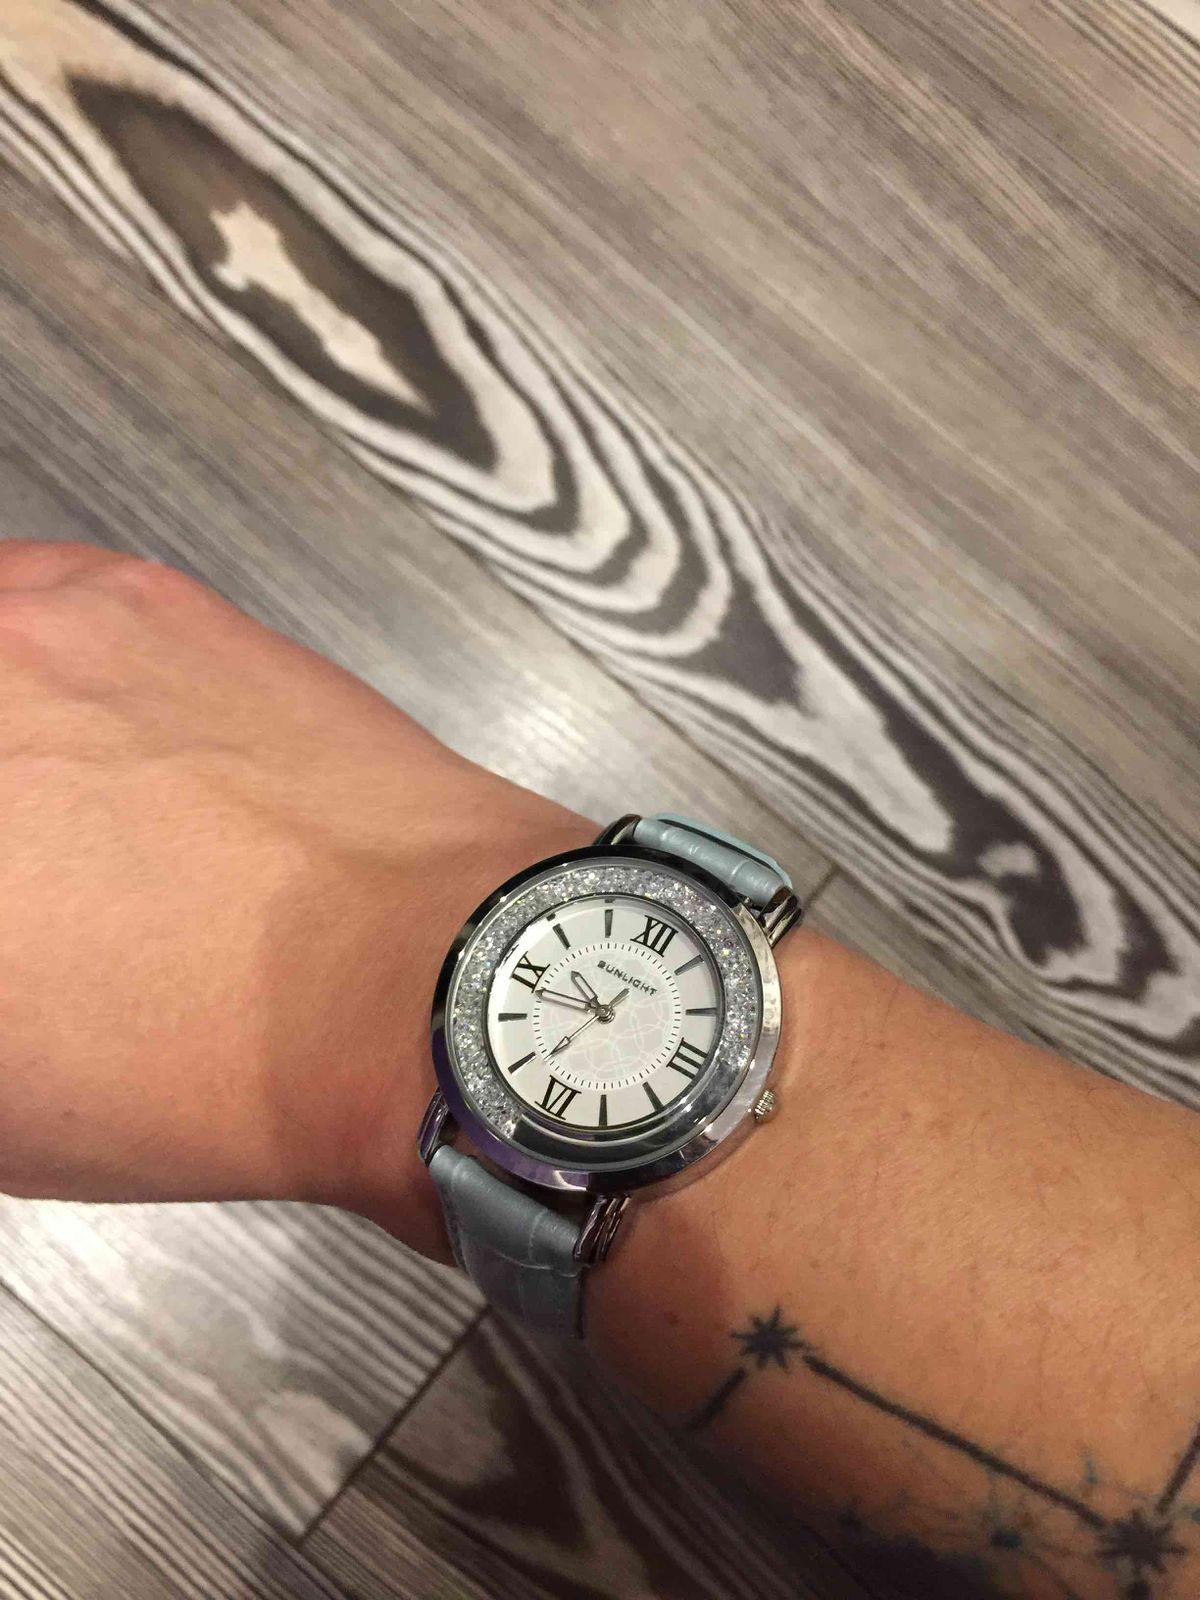 Часы с плавающими стразами в стиле chopard